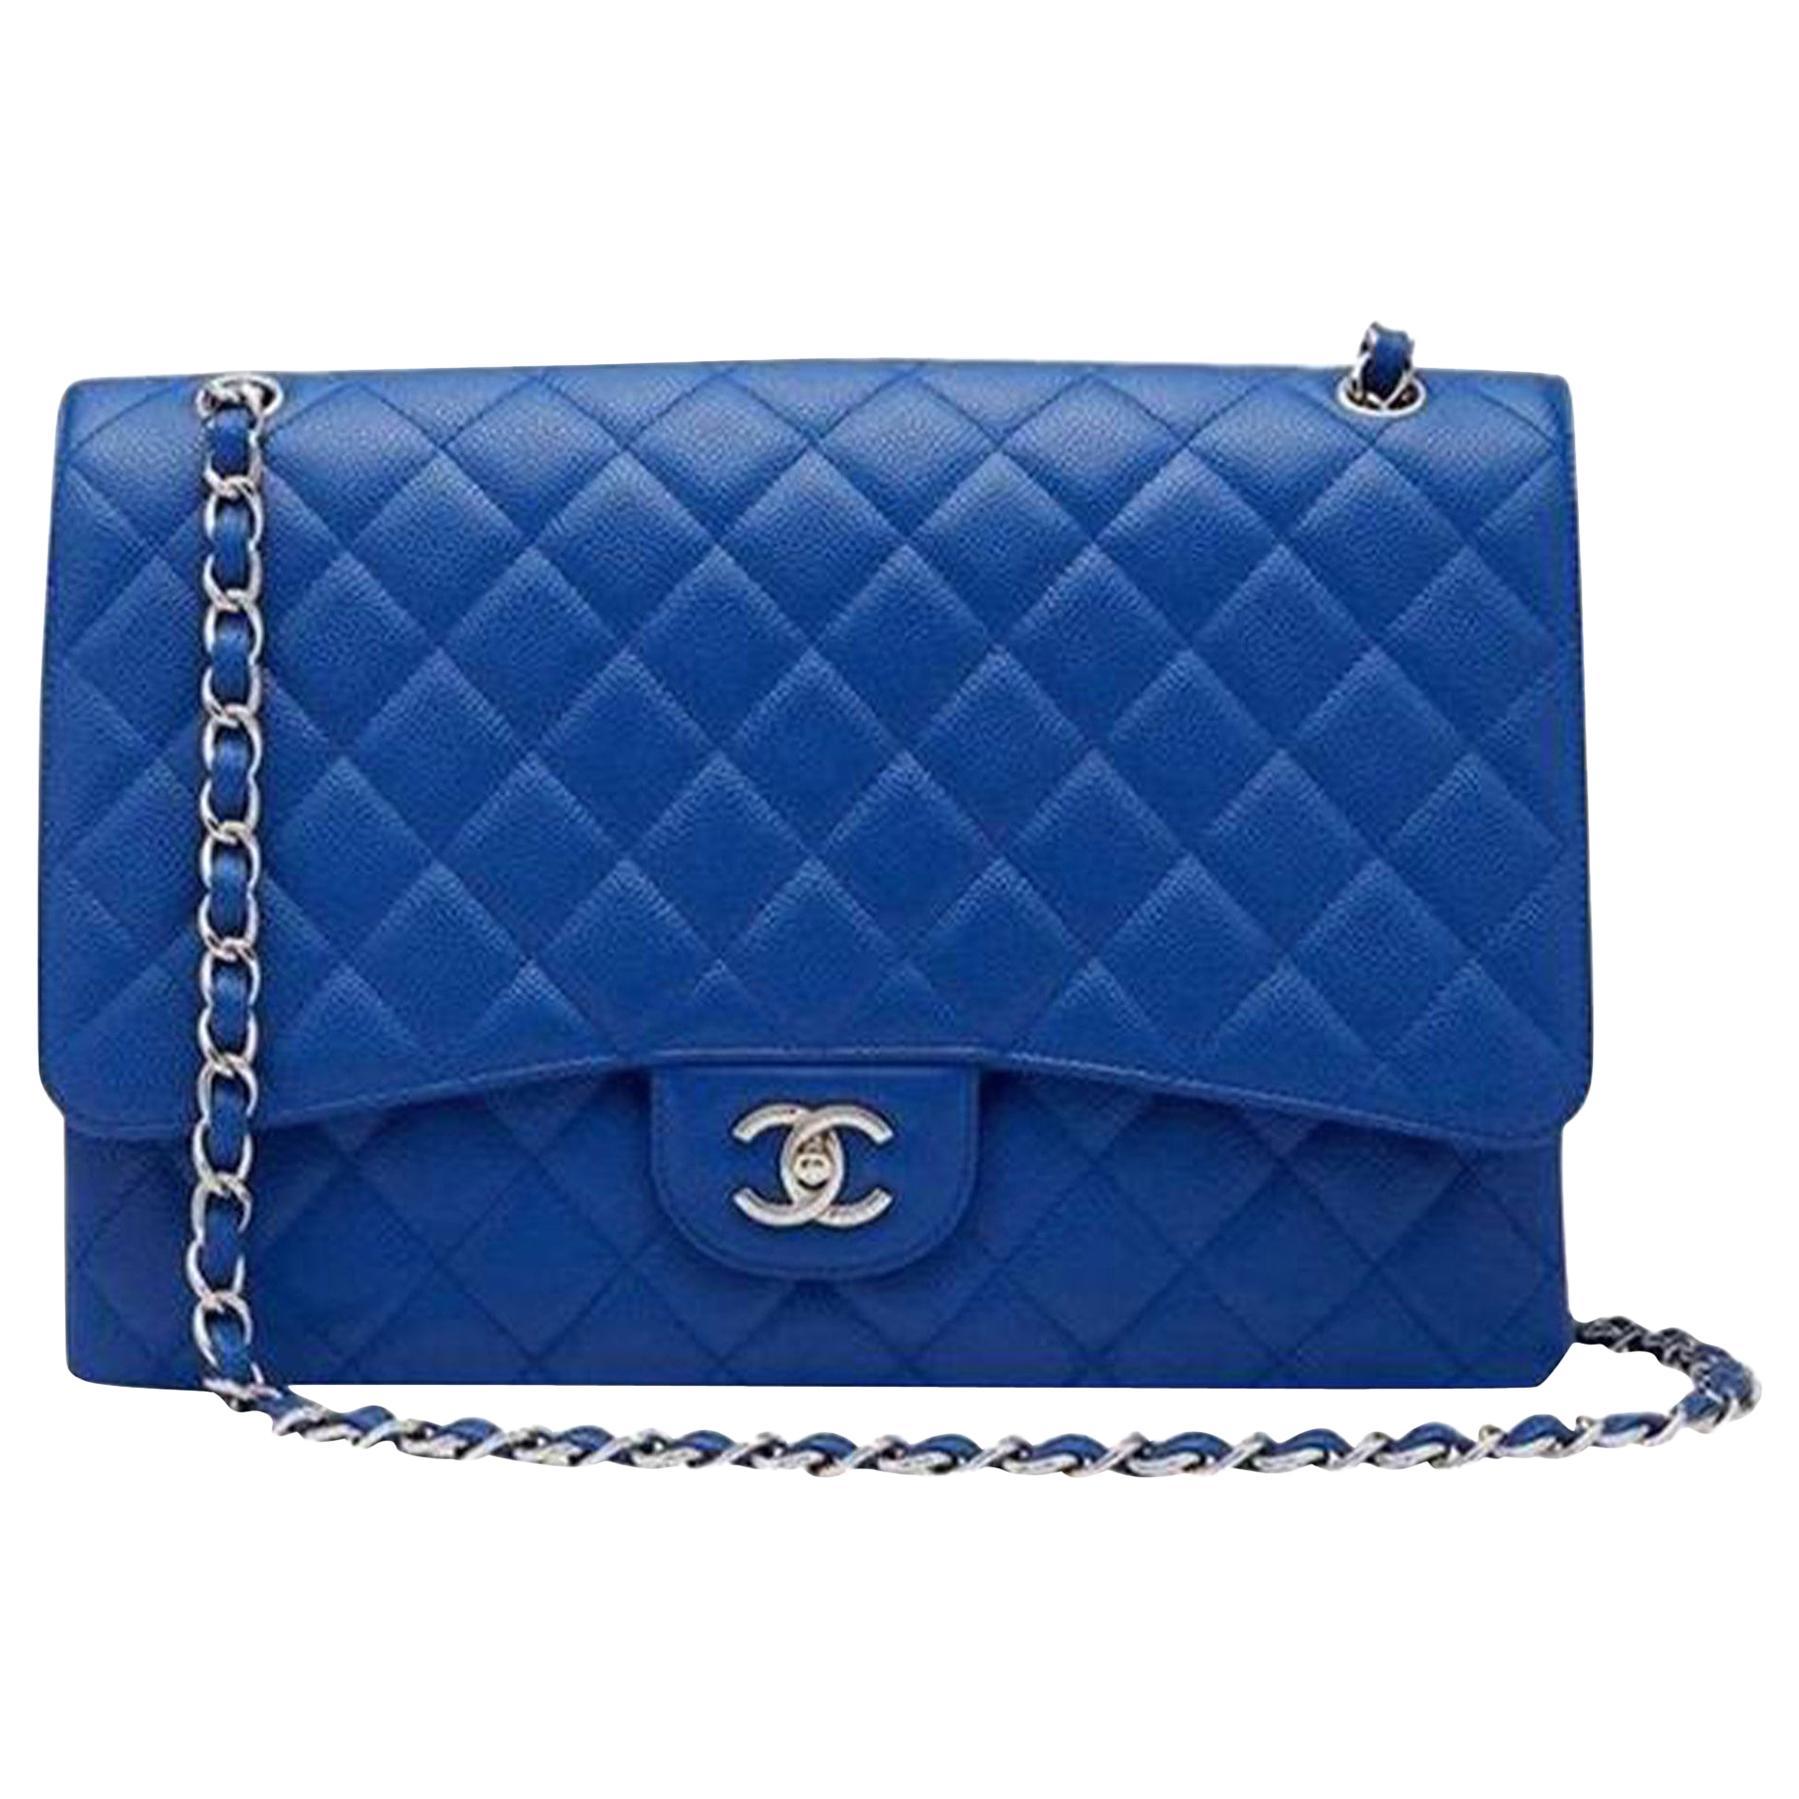 Chanel XL Classic Flap Limited Edition Maxi Blue Caviar Bag